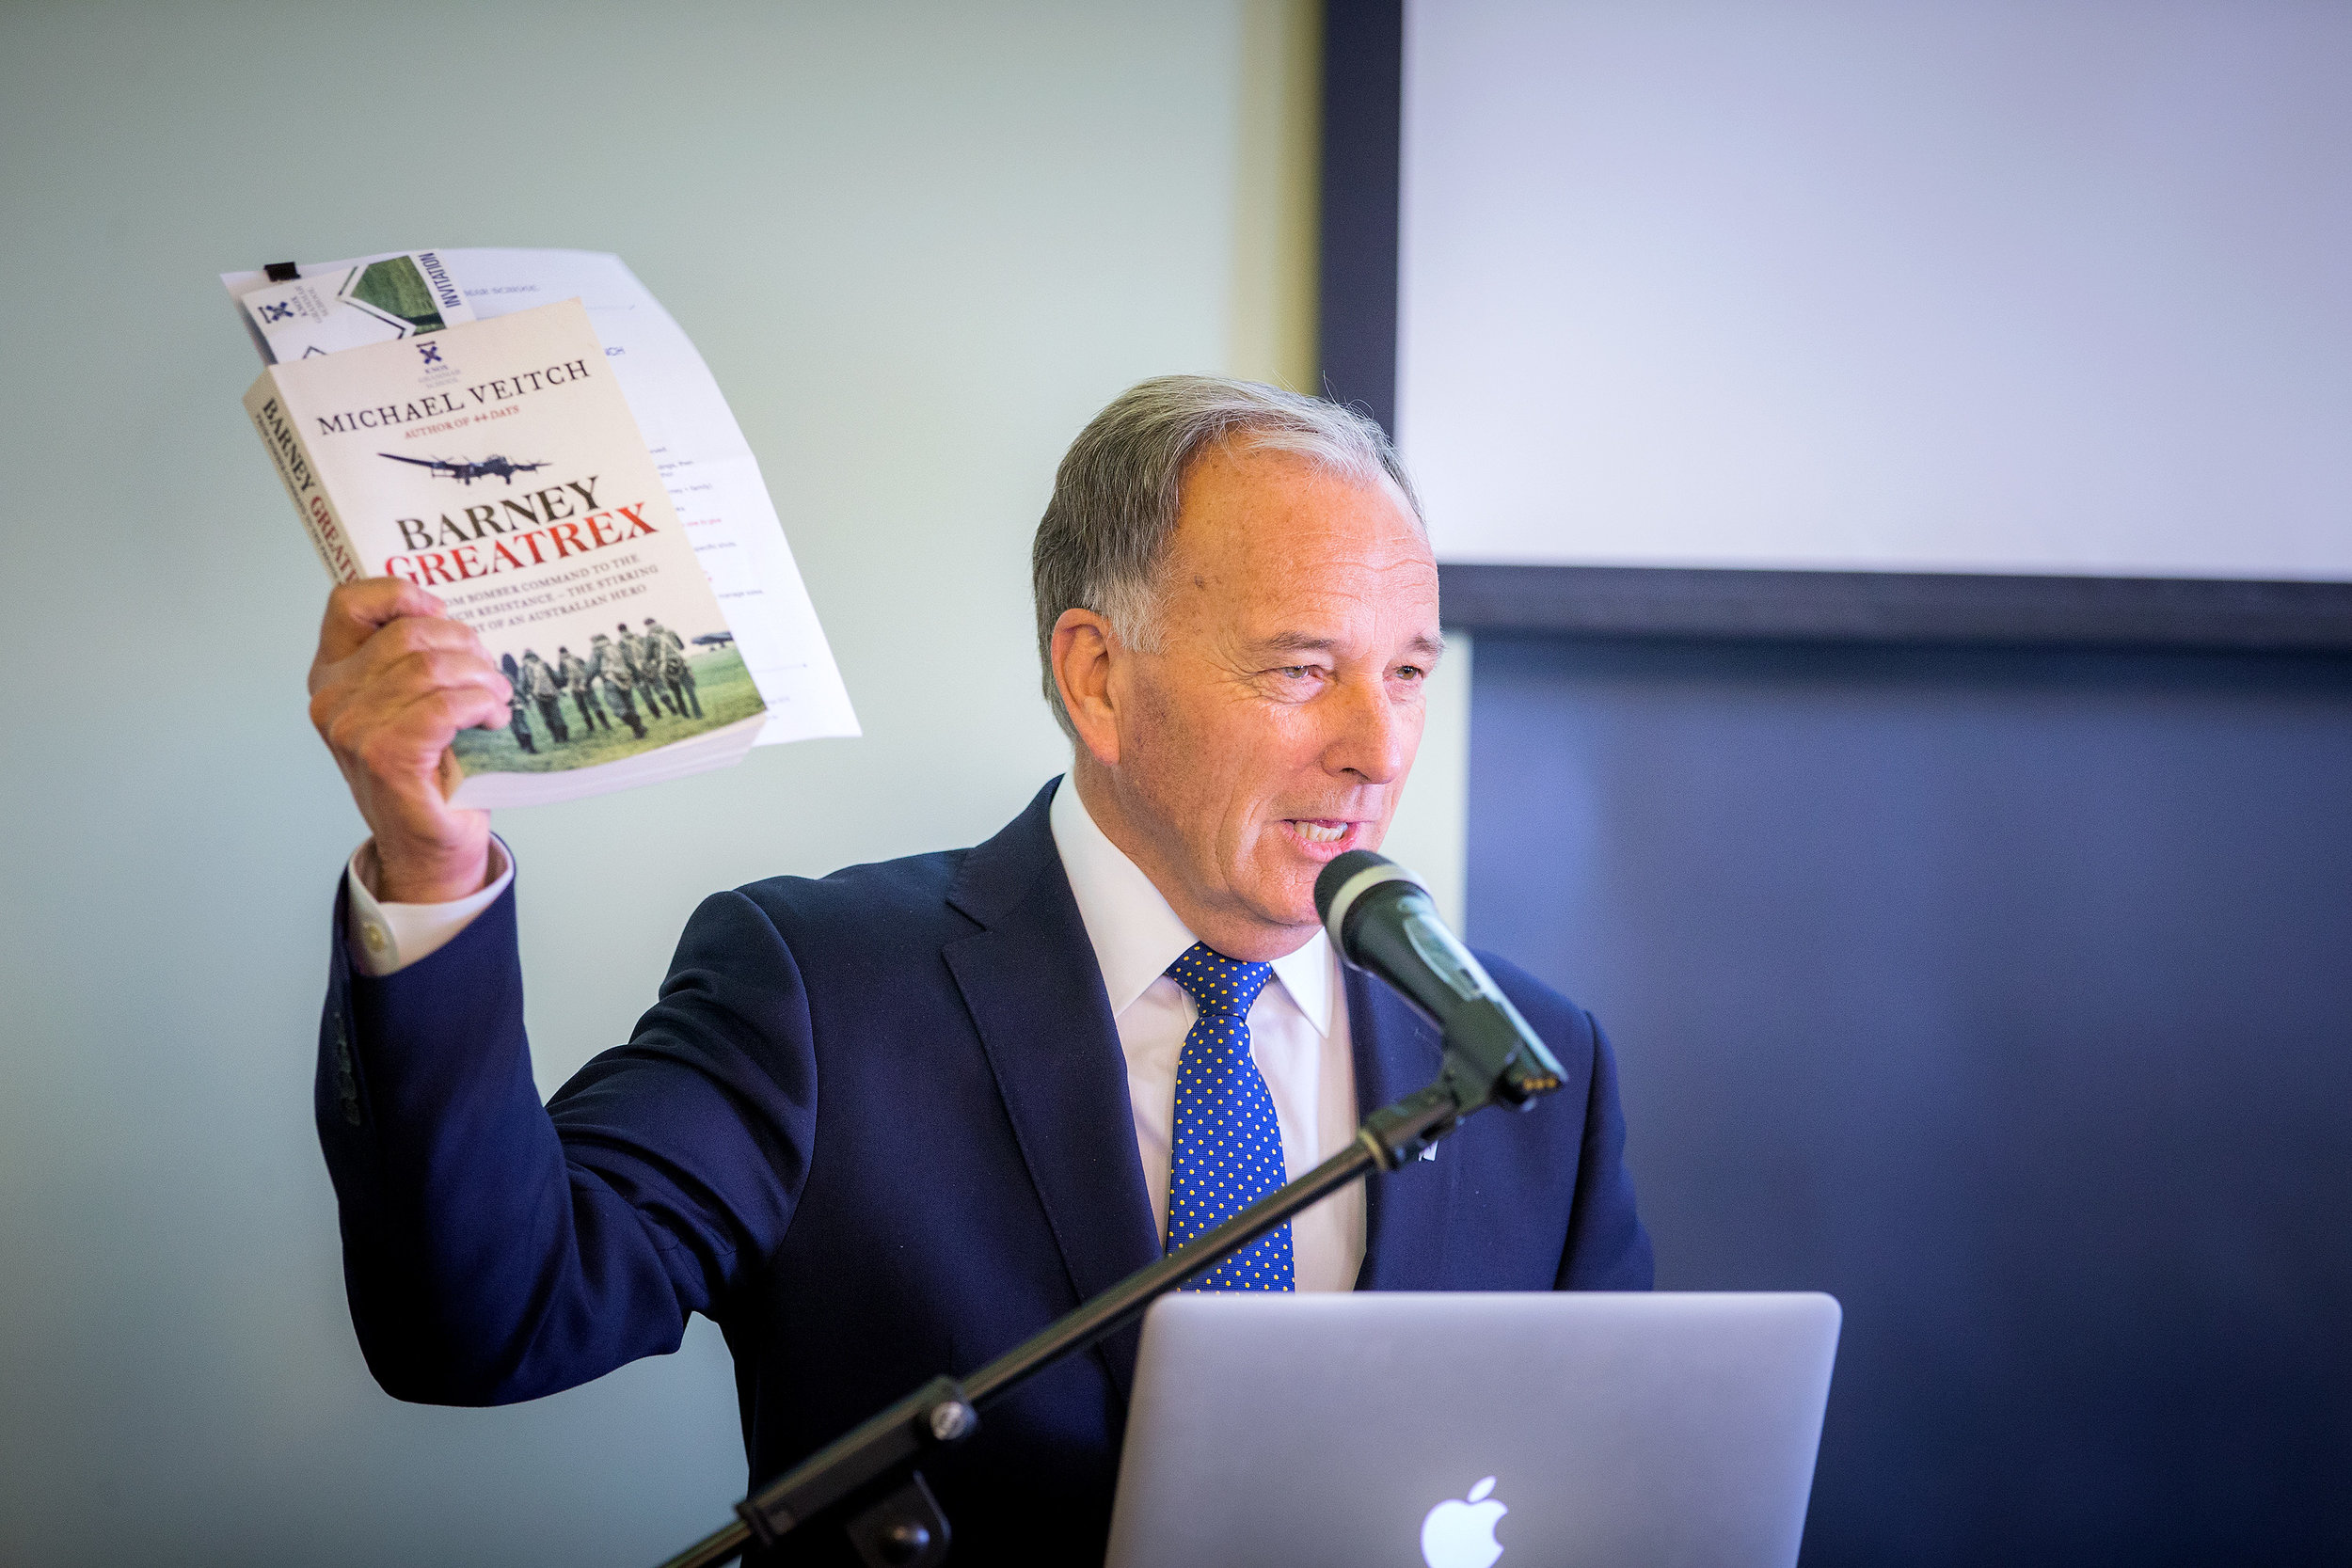 John Weeks launching the book.